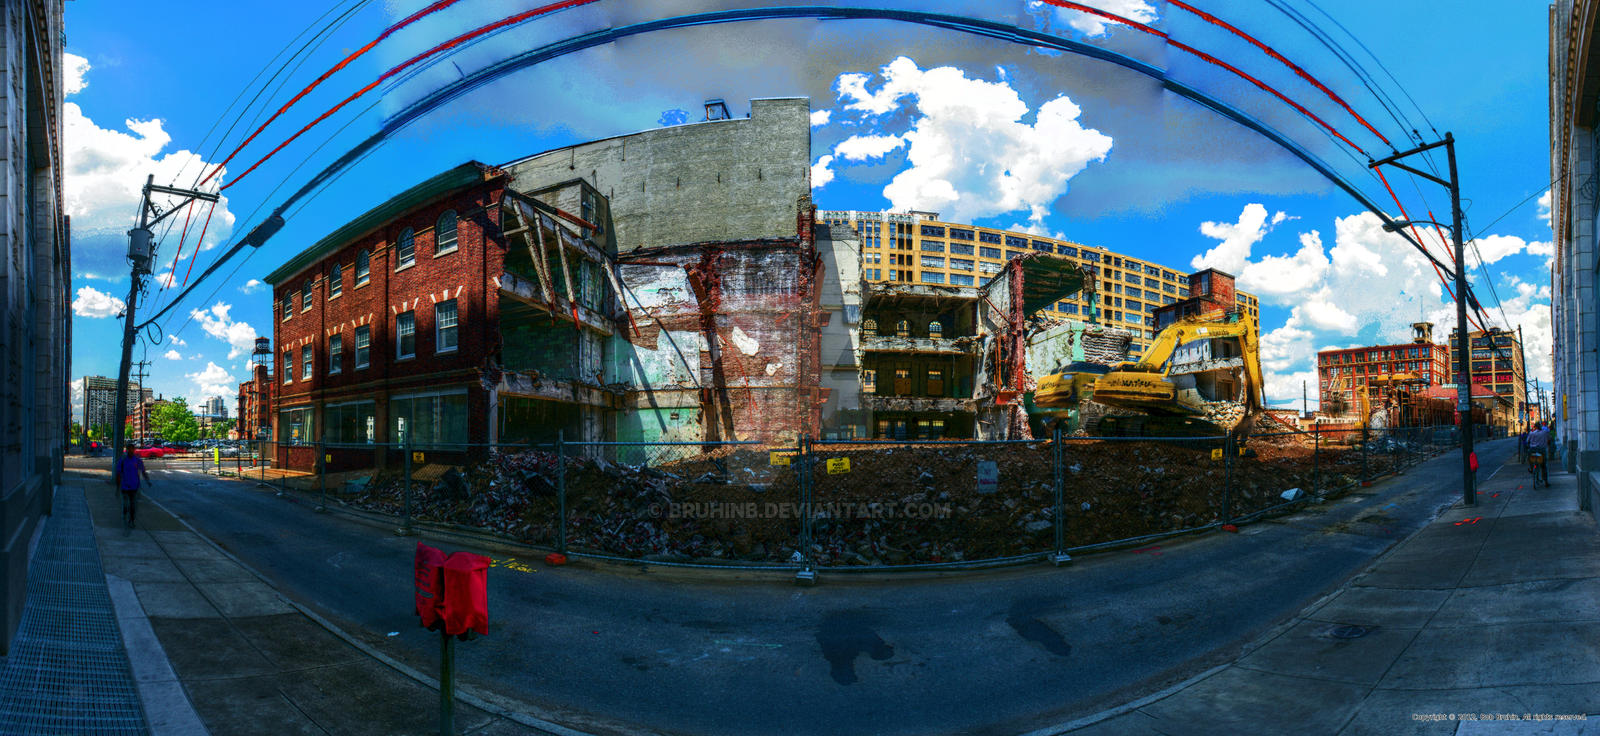 Panorama 1719 hdr pregamma 1 mantiuk contrast  by bruhinb